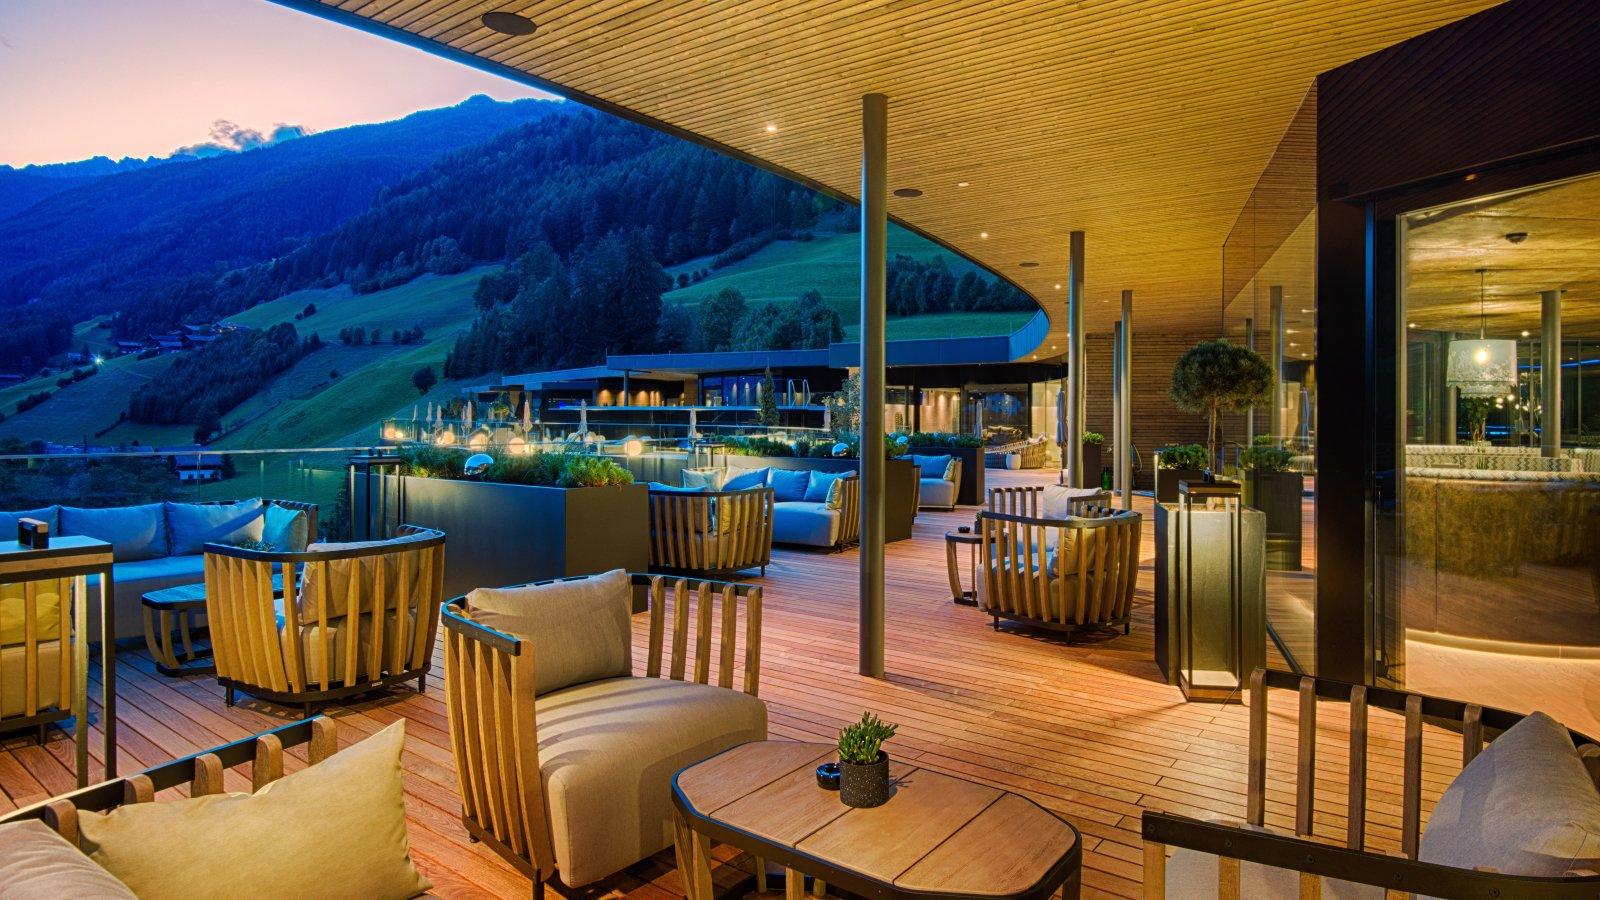 Design spa & wellness hotel in South Tyrol - AMONTI & LUNARIS